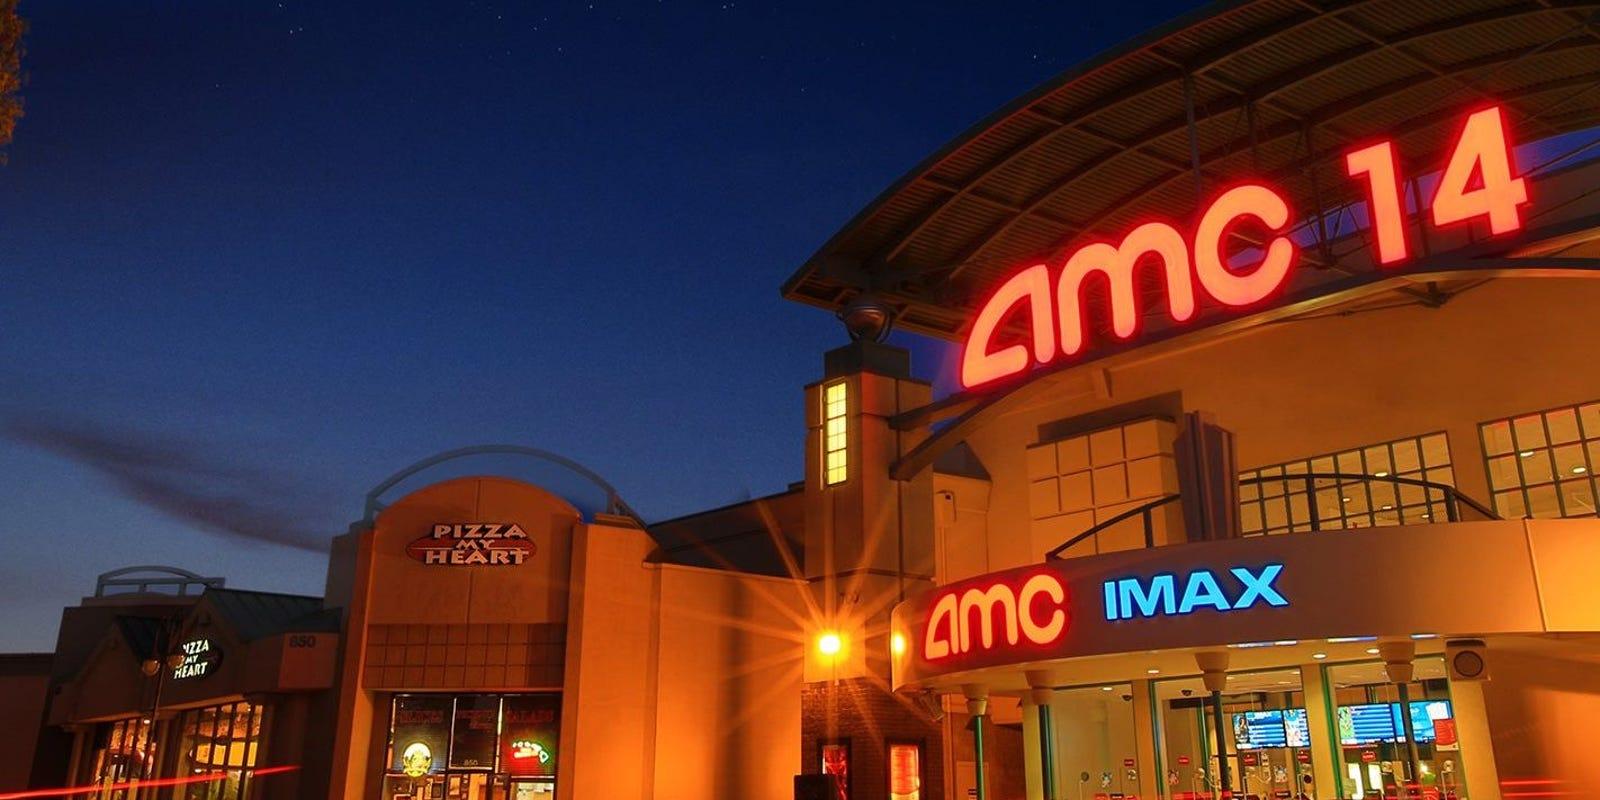 AMC theater chain warns it may not survive coronavirus fallout